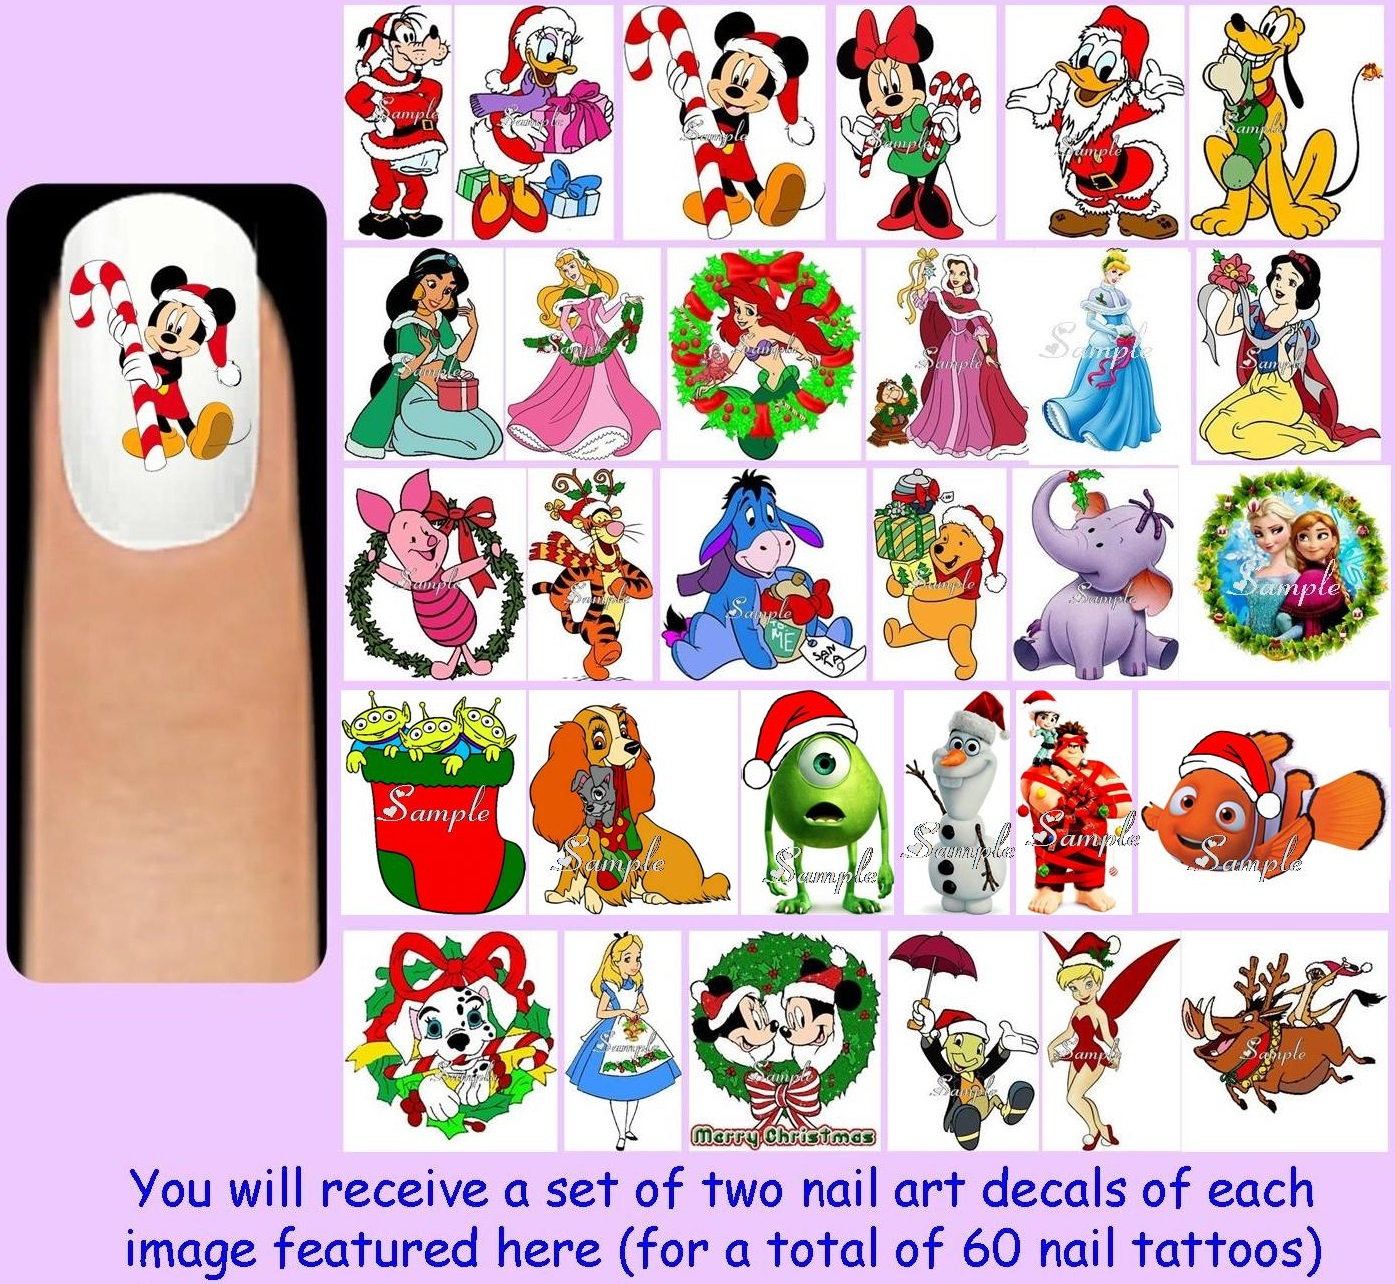 60x Disney Christmas Nail Art Decals Free Gems Mickey Minnie Mouse